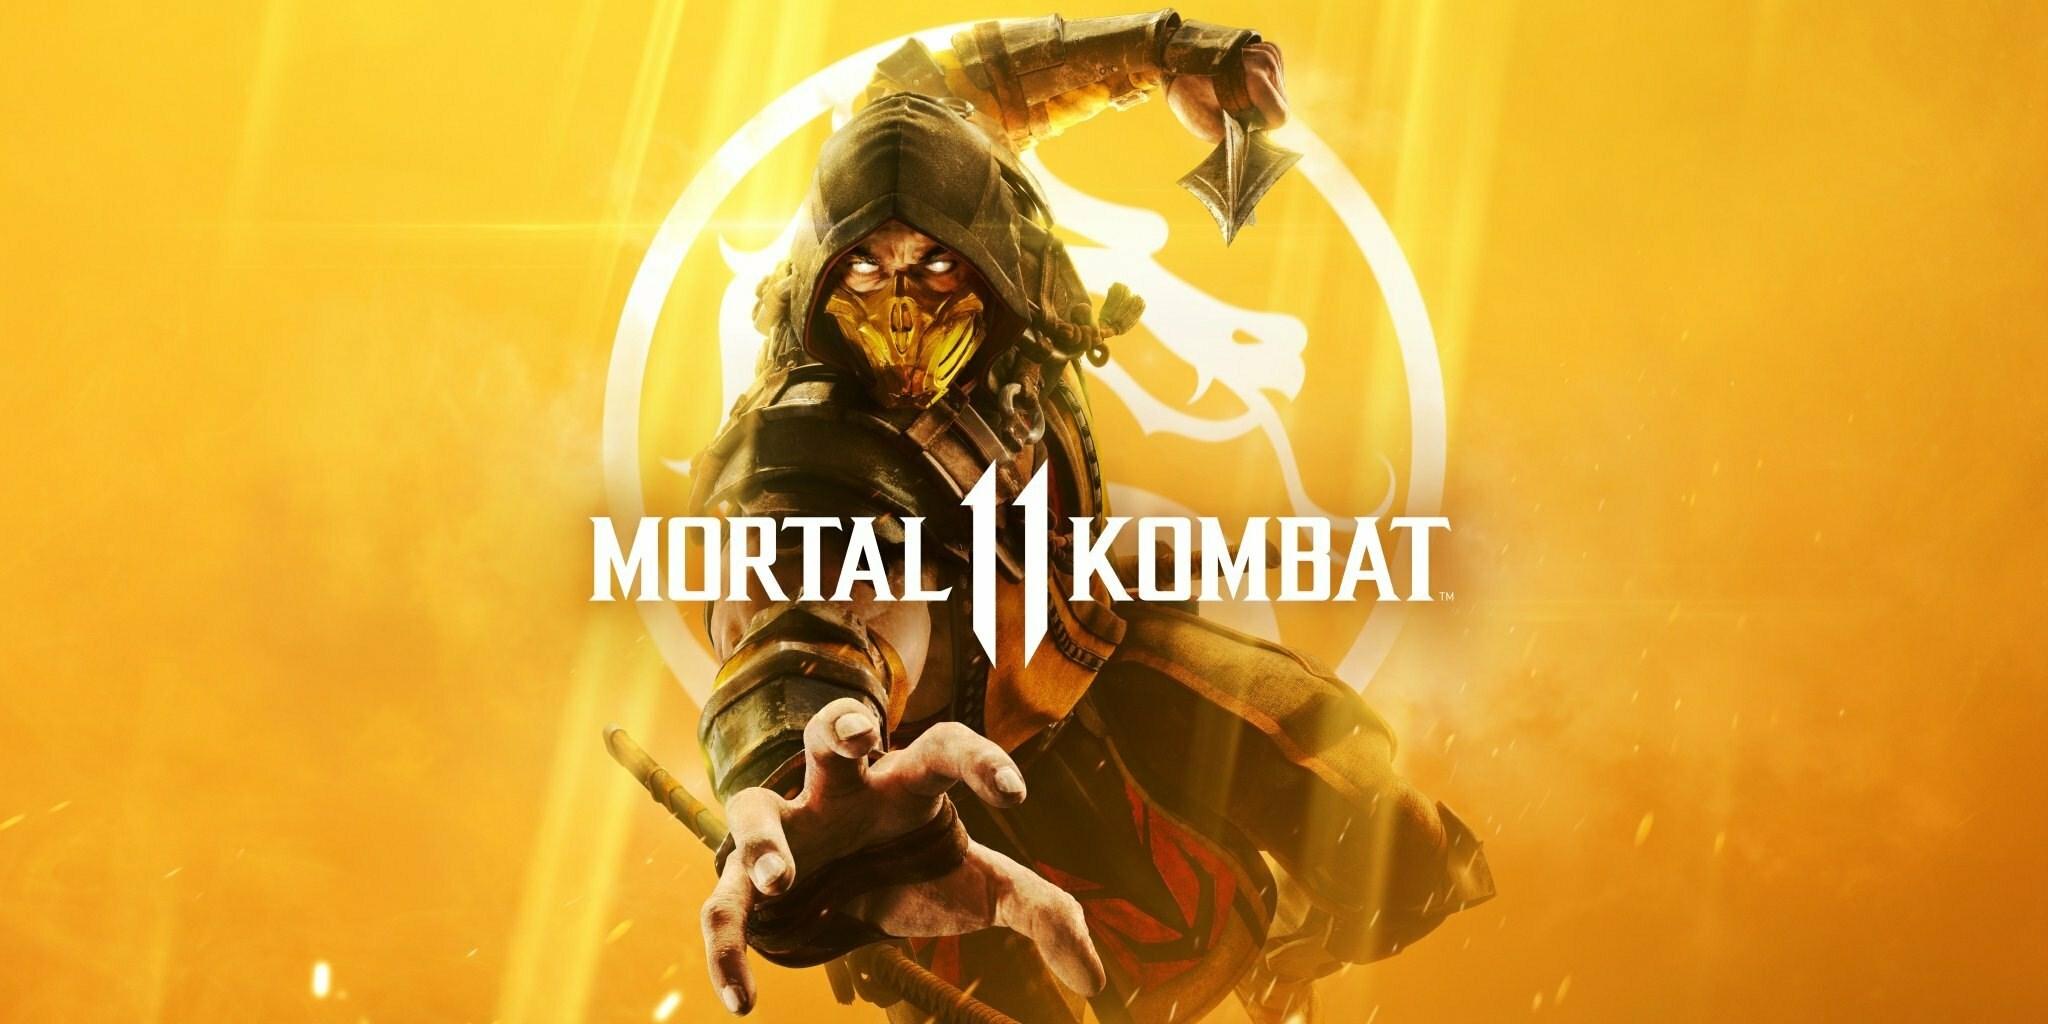 Mortal Kombat 11 revelará la próxima semana nuevos personajes